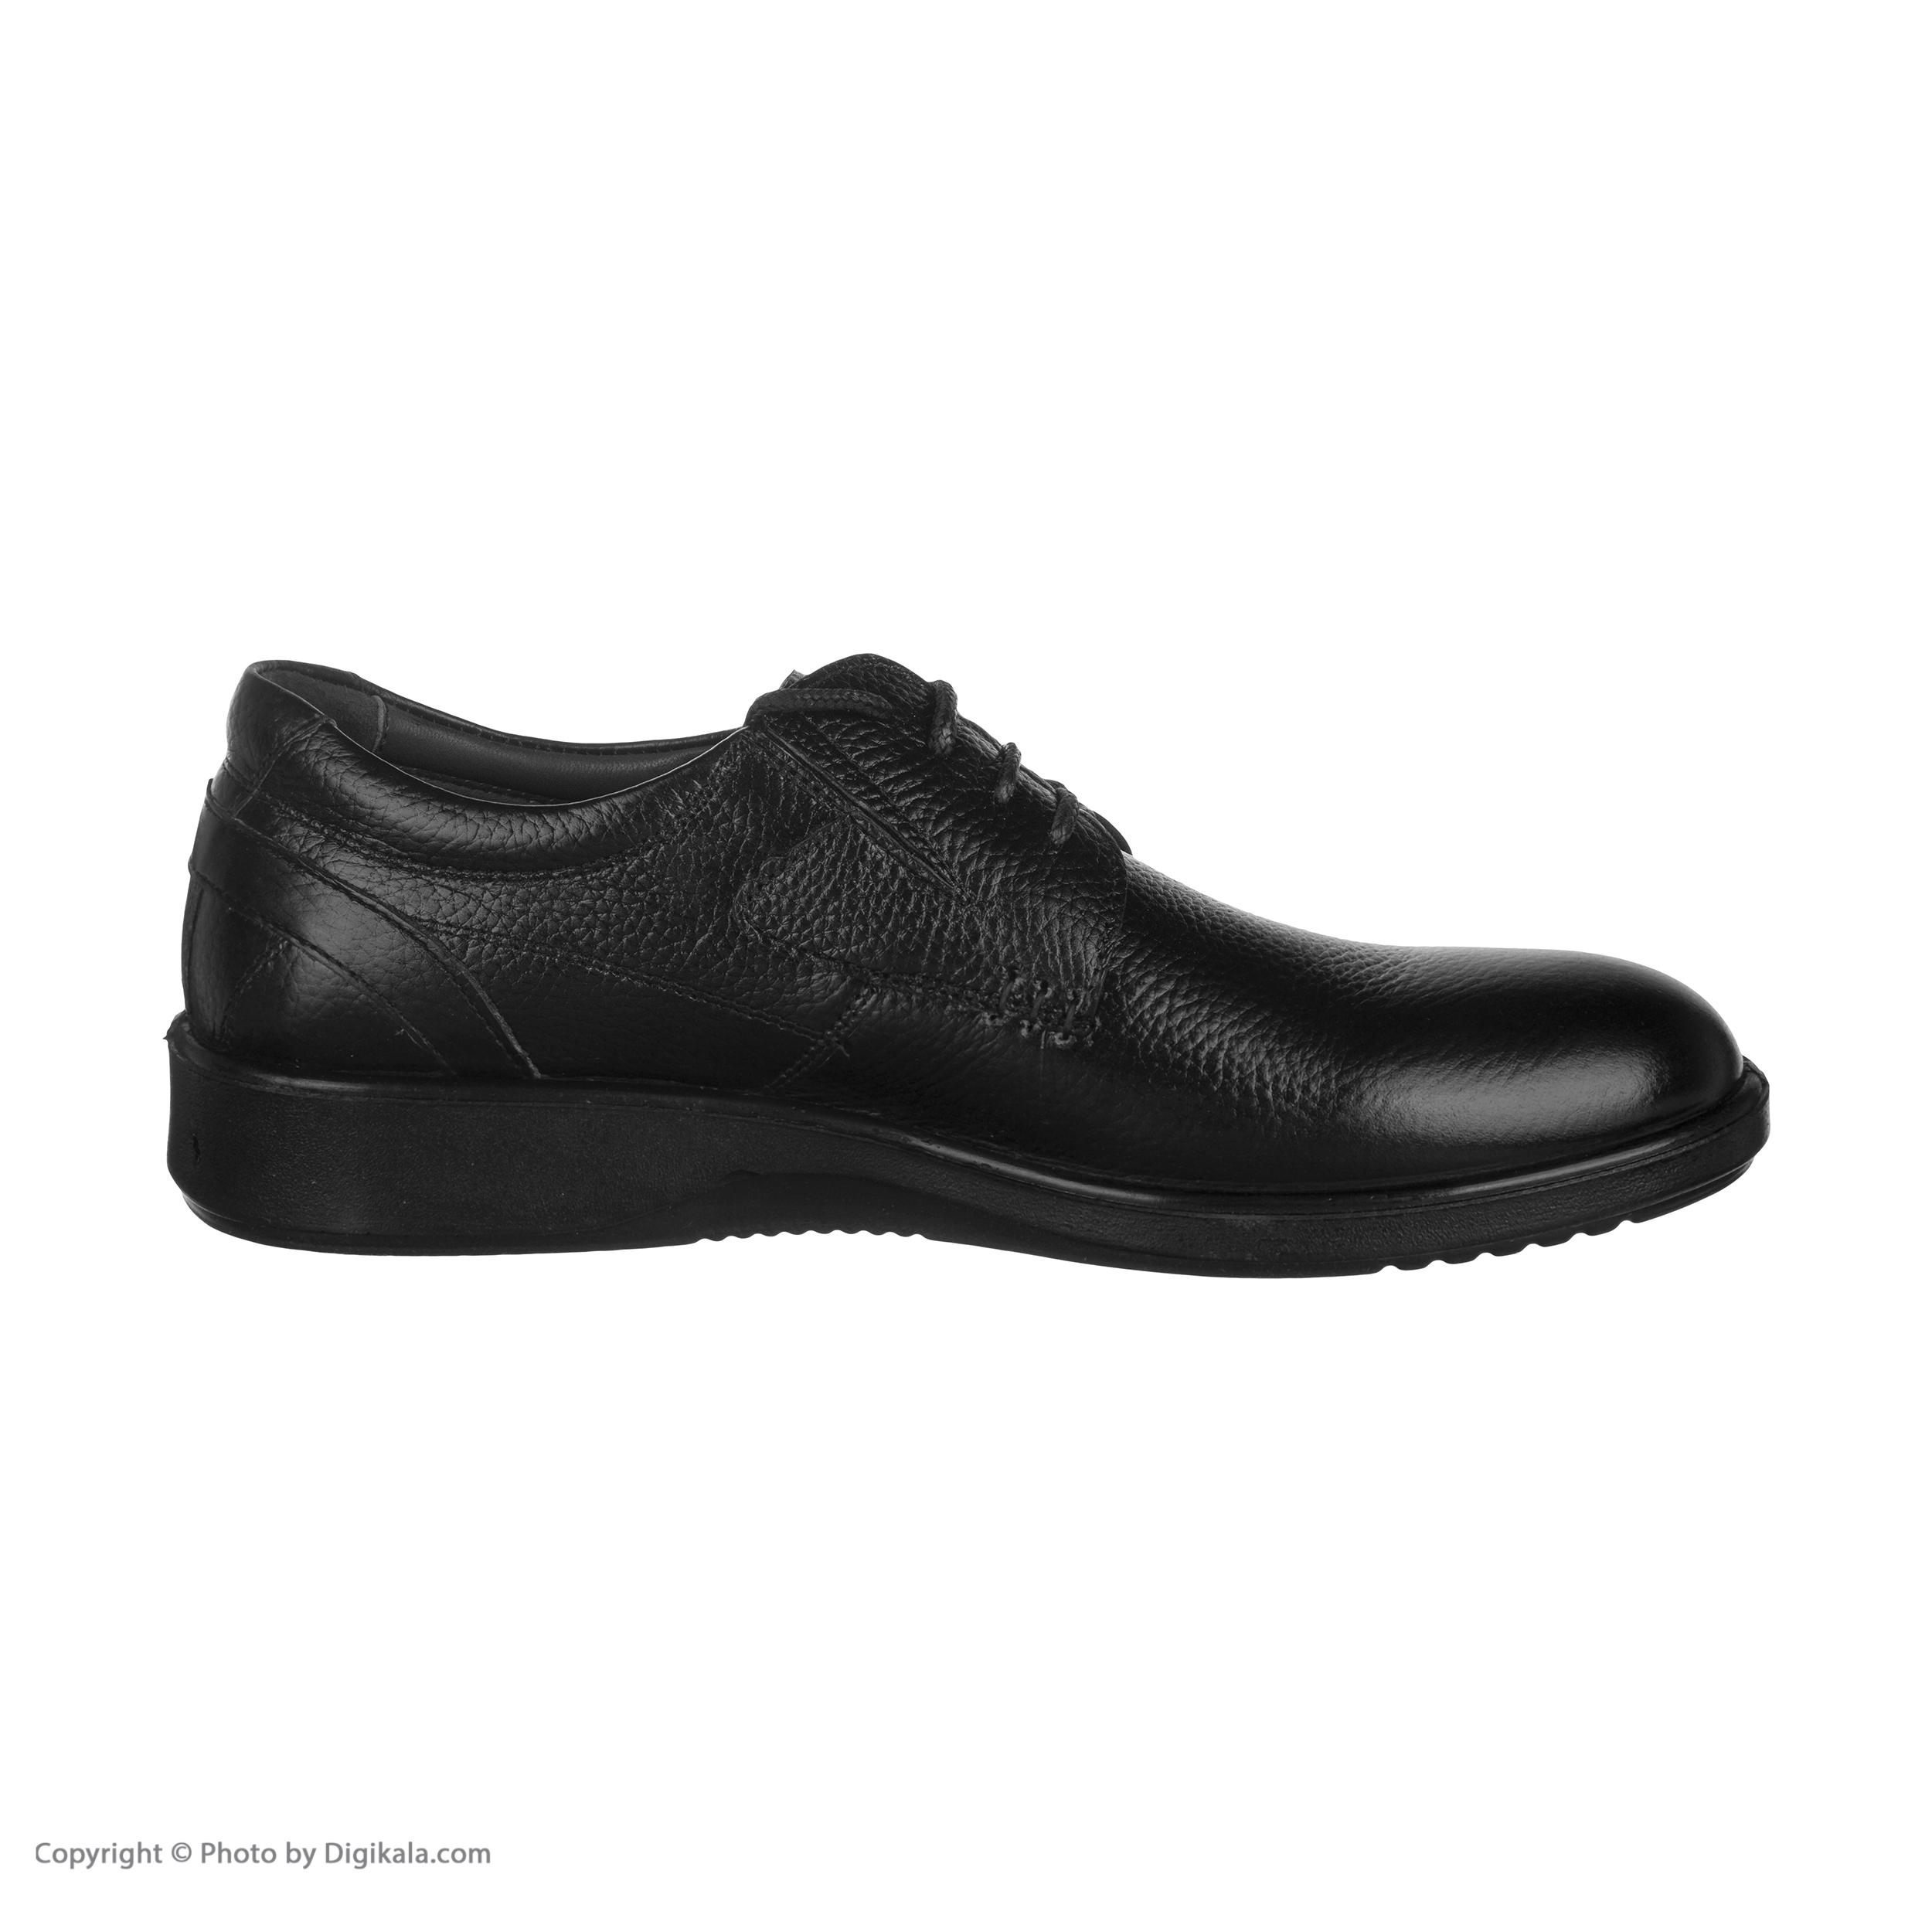 کفش روزمره مردانه آذر پلاس مدل 9438B503101 -  - 7